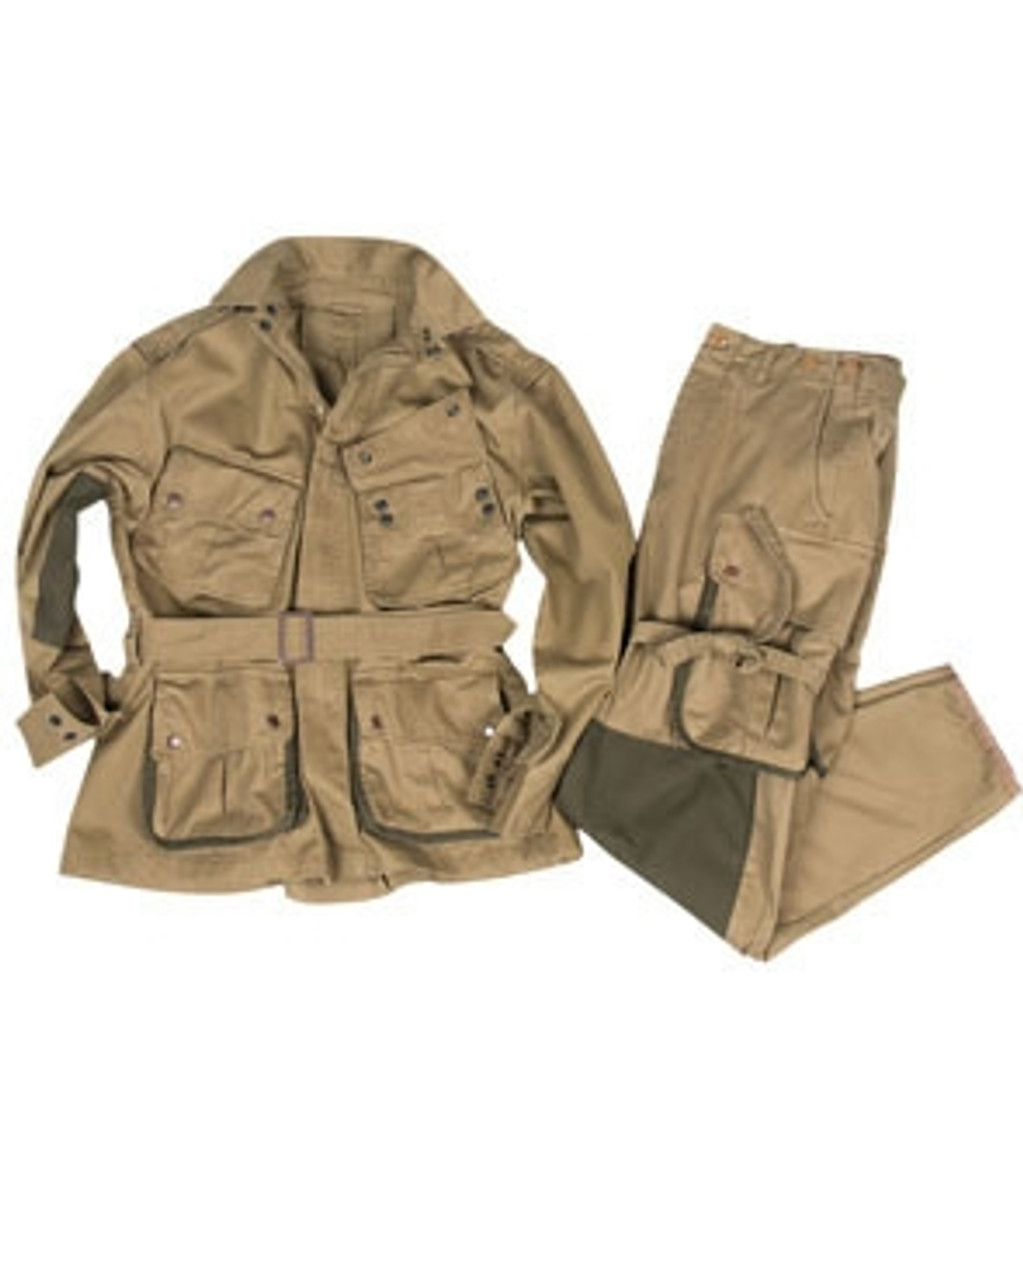 M42 Paratrooper Jump Suit - Re-enforced from Hessen Antique